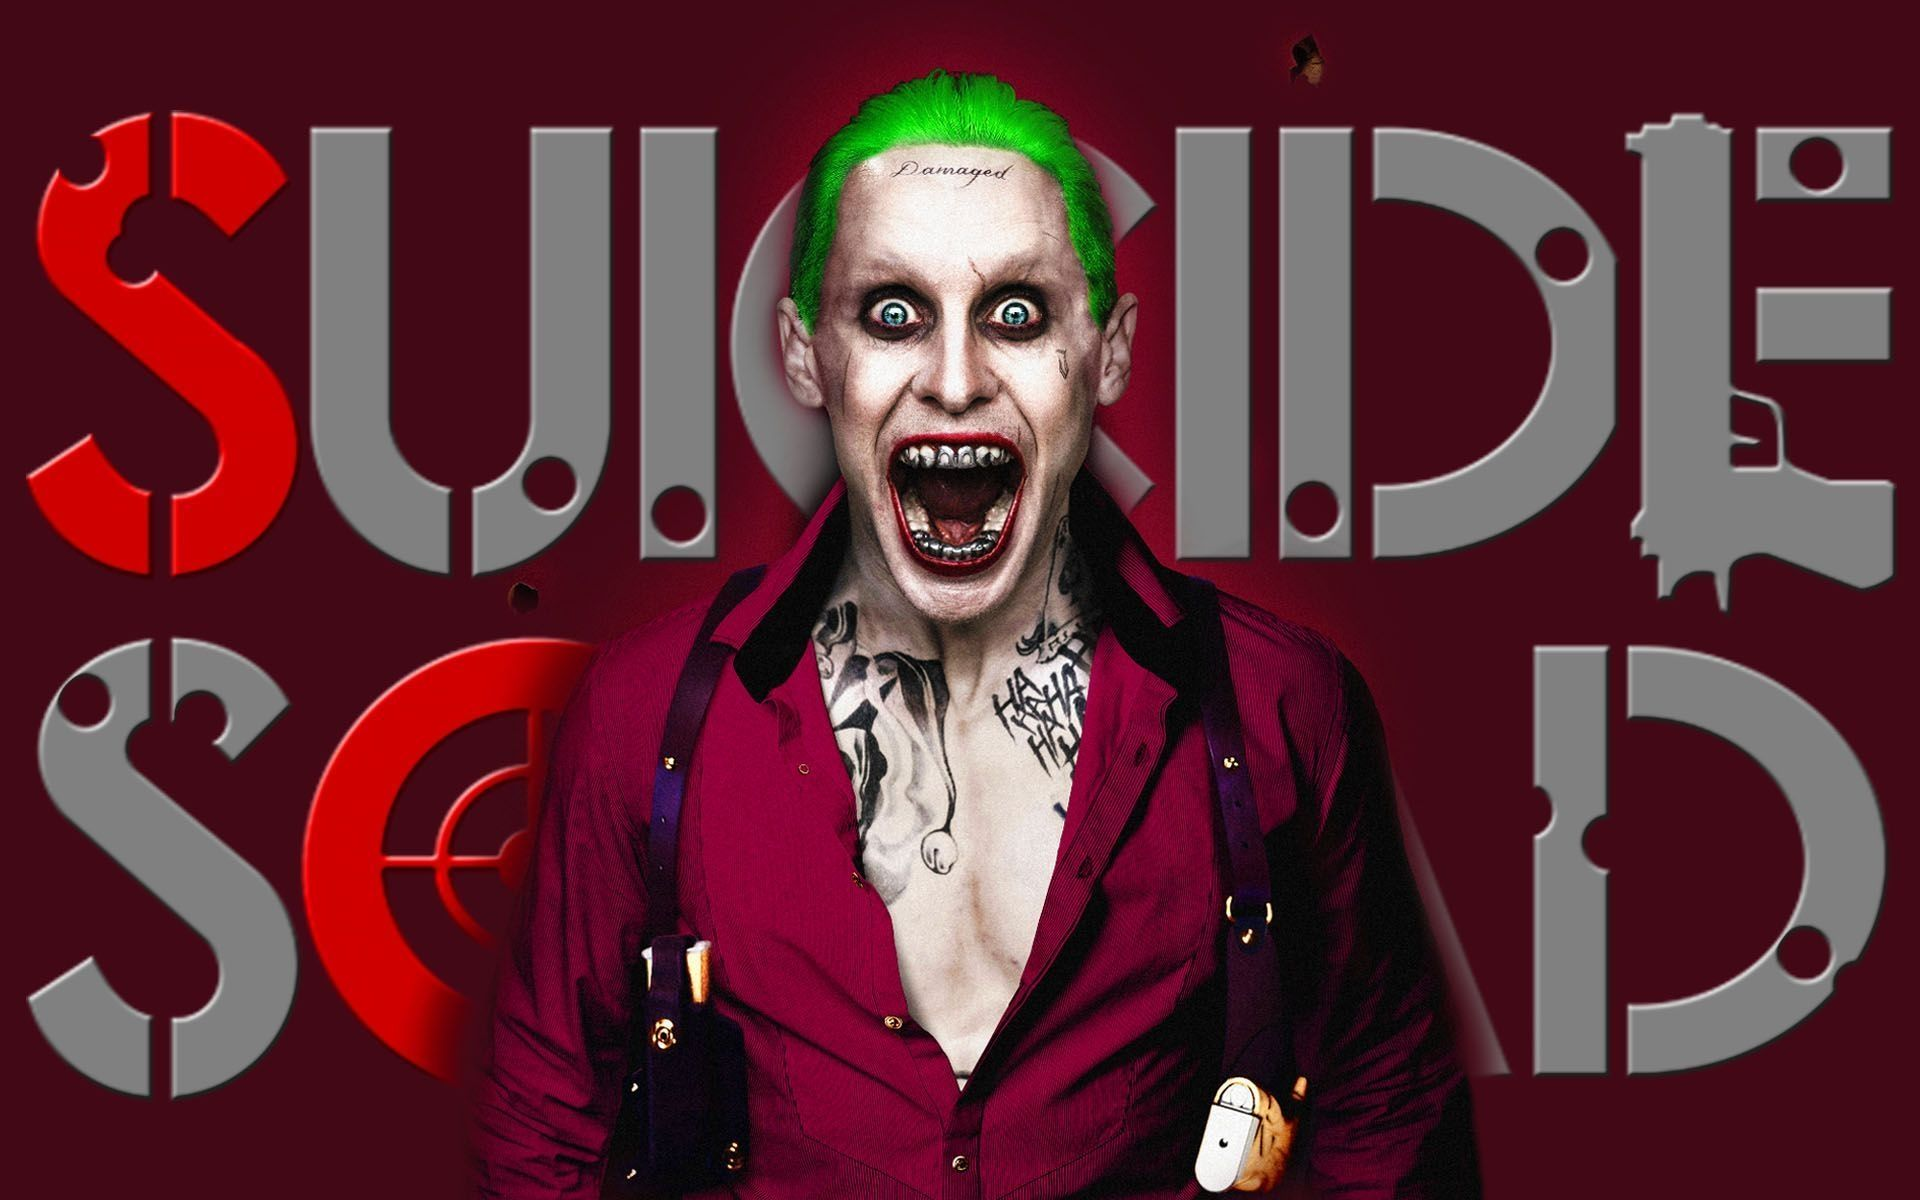 Suicide Squad, Joker HD Wallpaper 1080